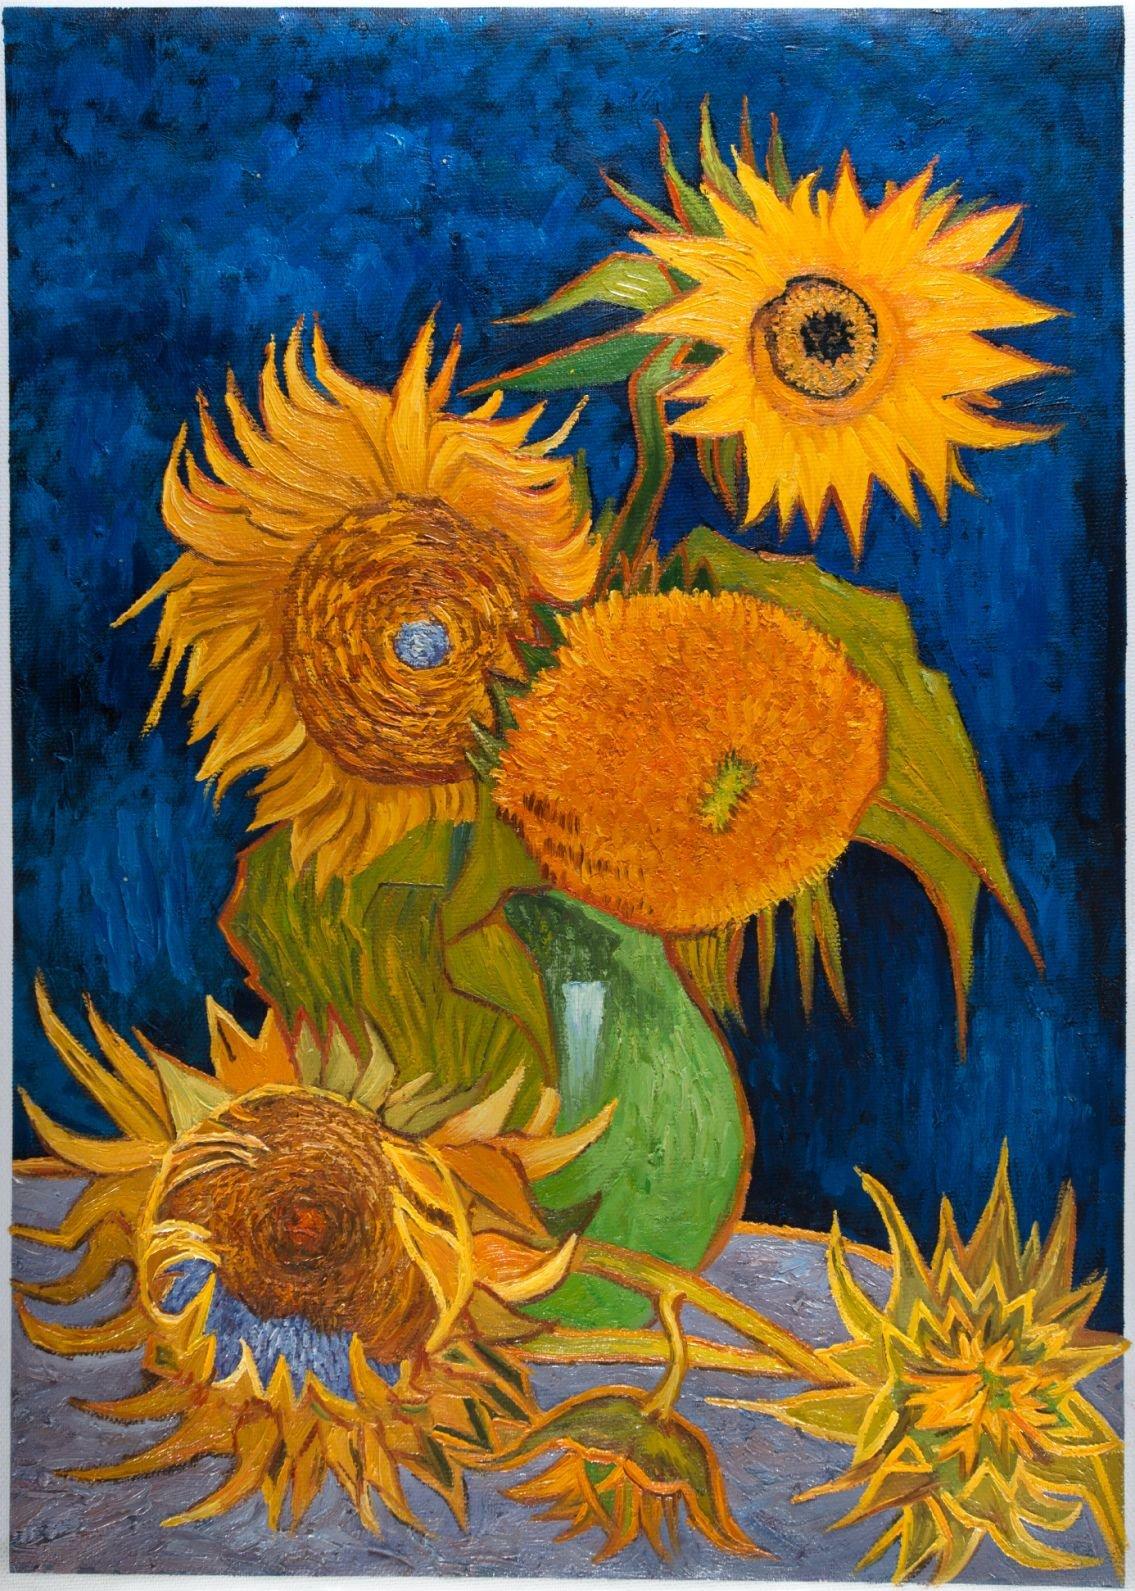 Vase With Five Sunflowers Van Gogh Reproduction Van Gogh